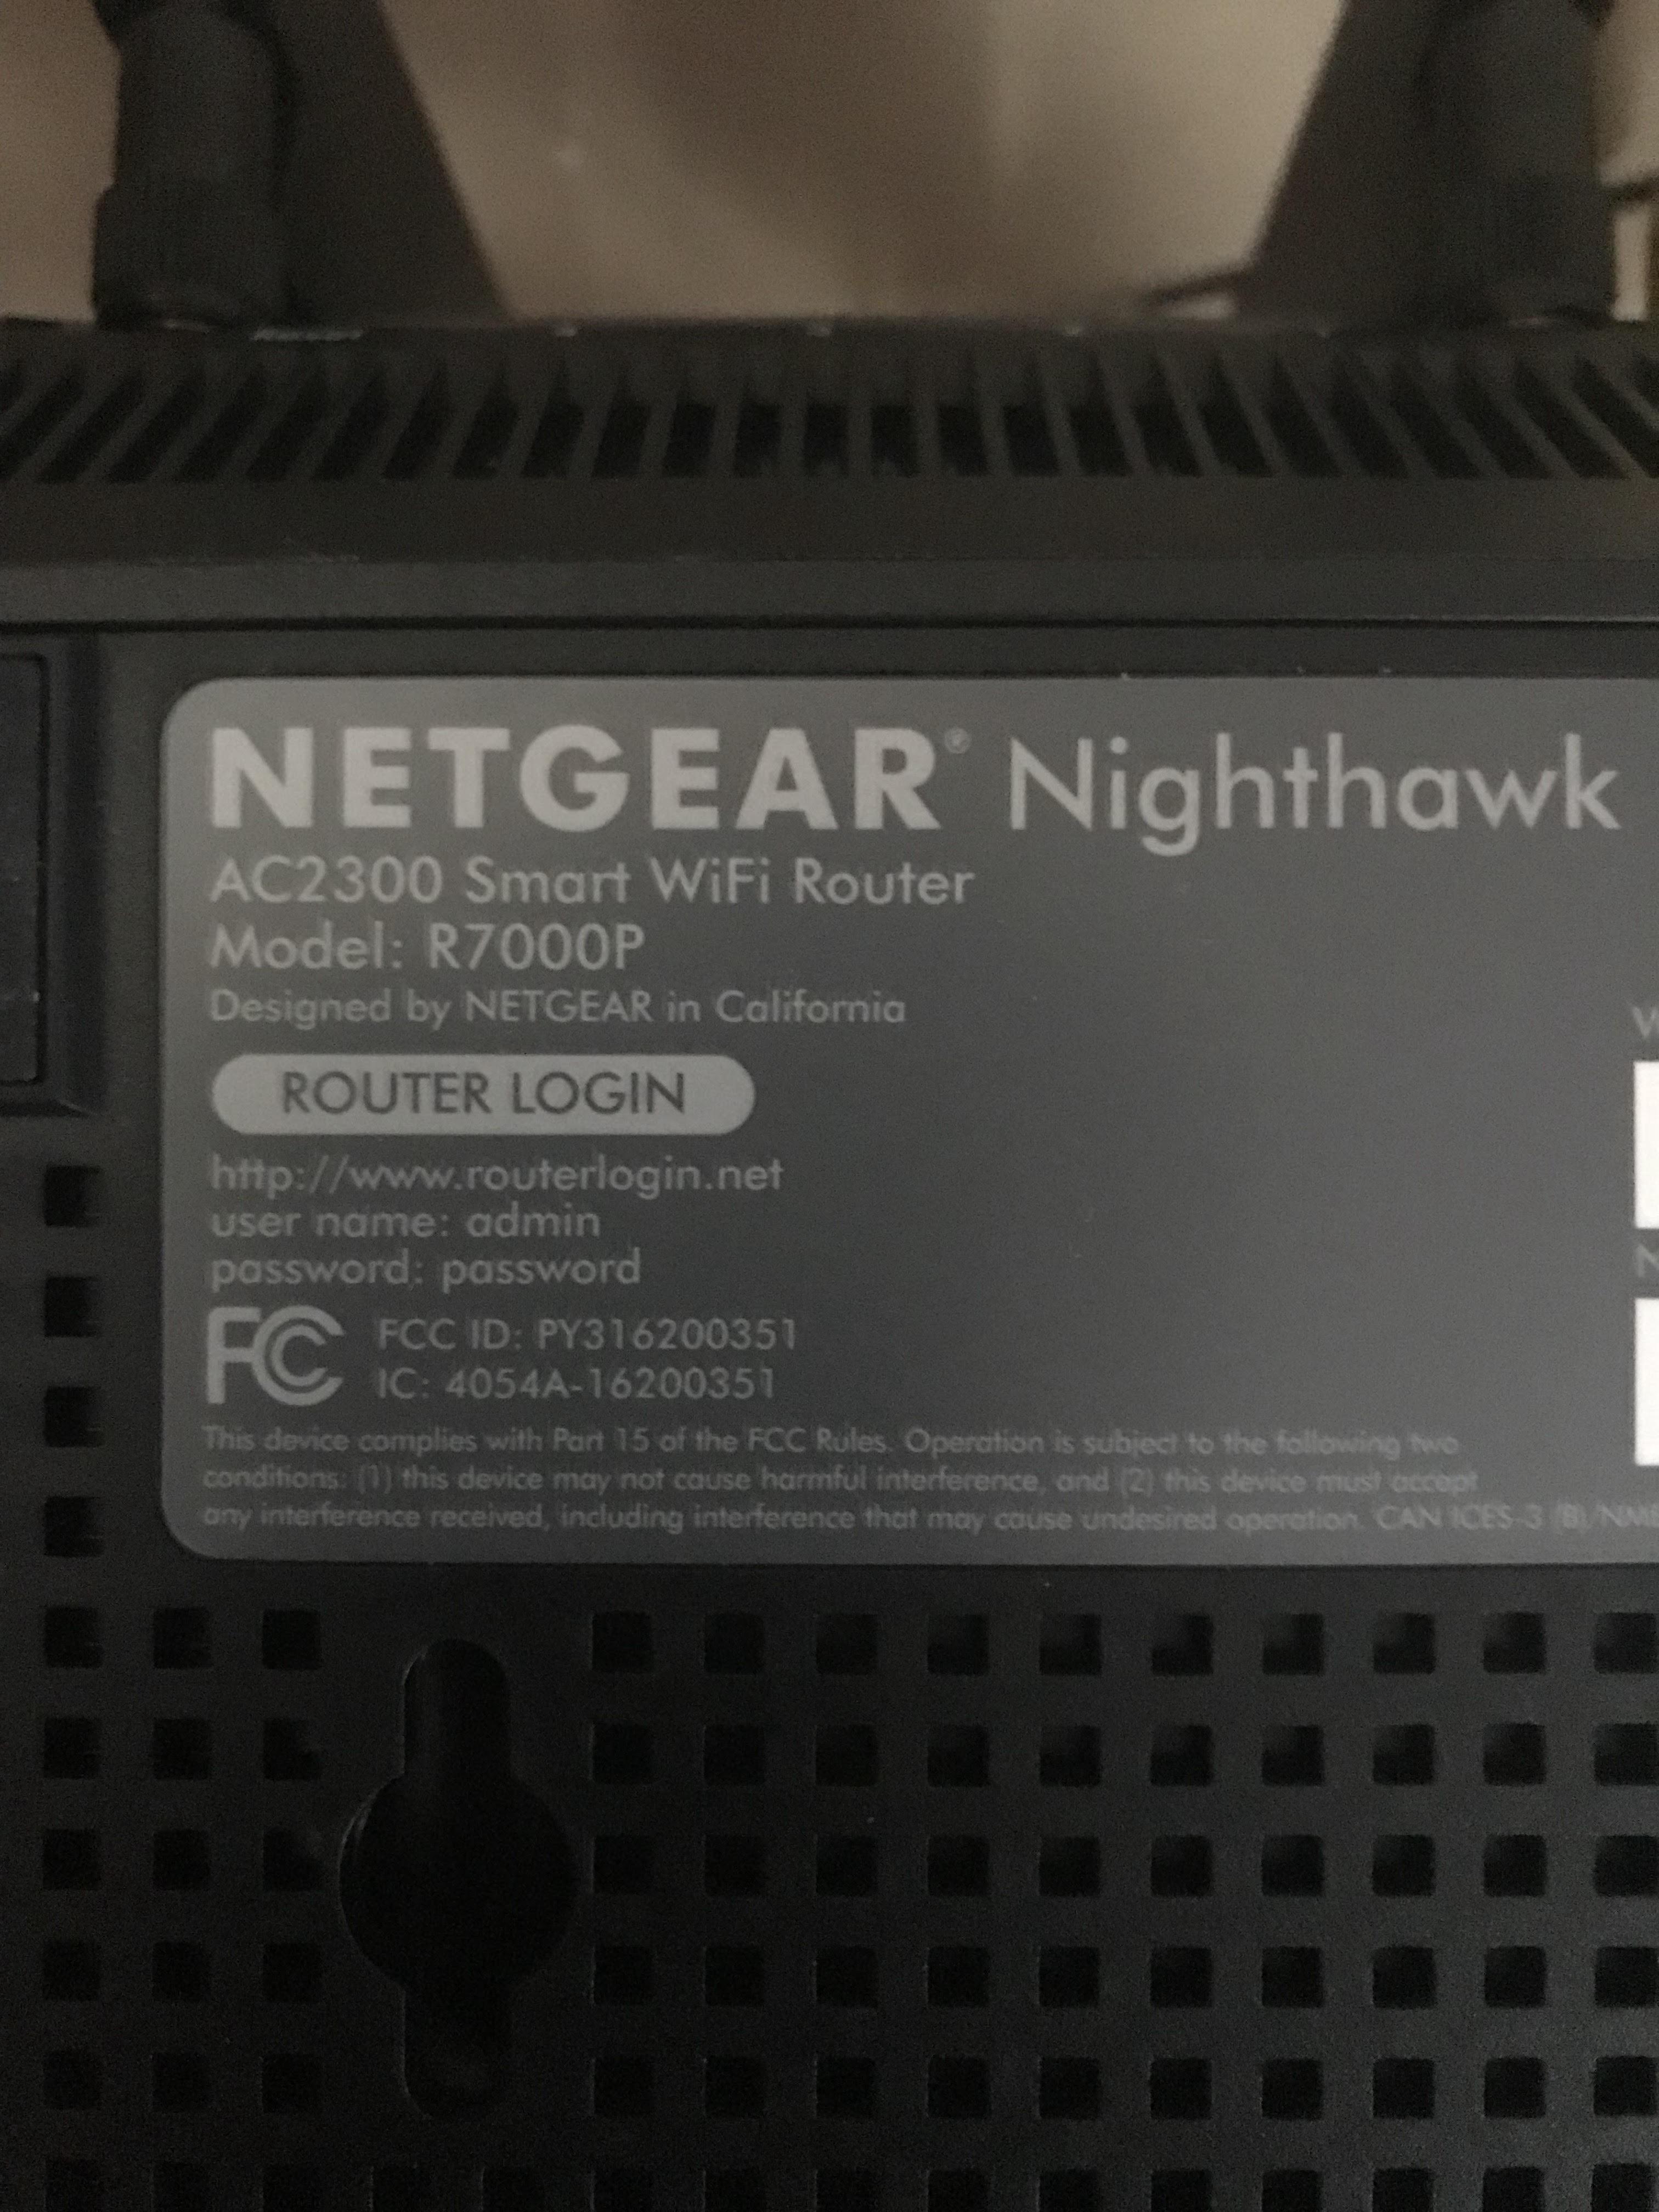 Nighthawk router won\'t connect to internet - NETGEAR Communities